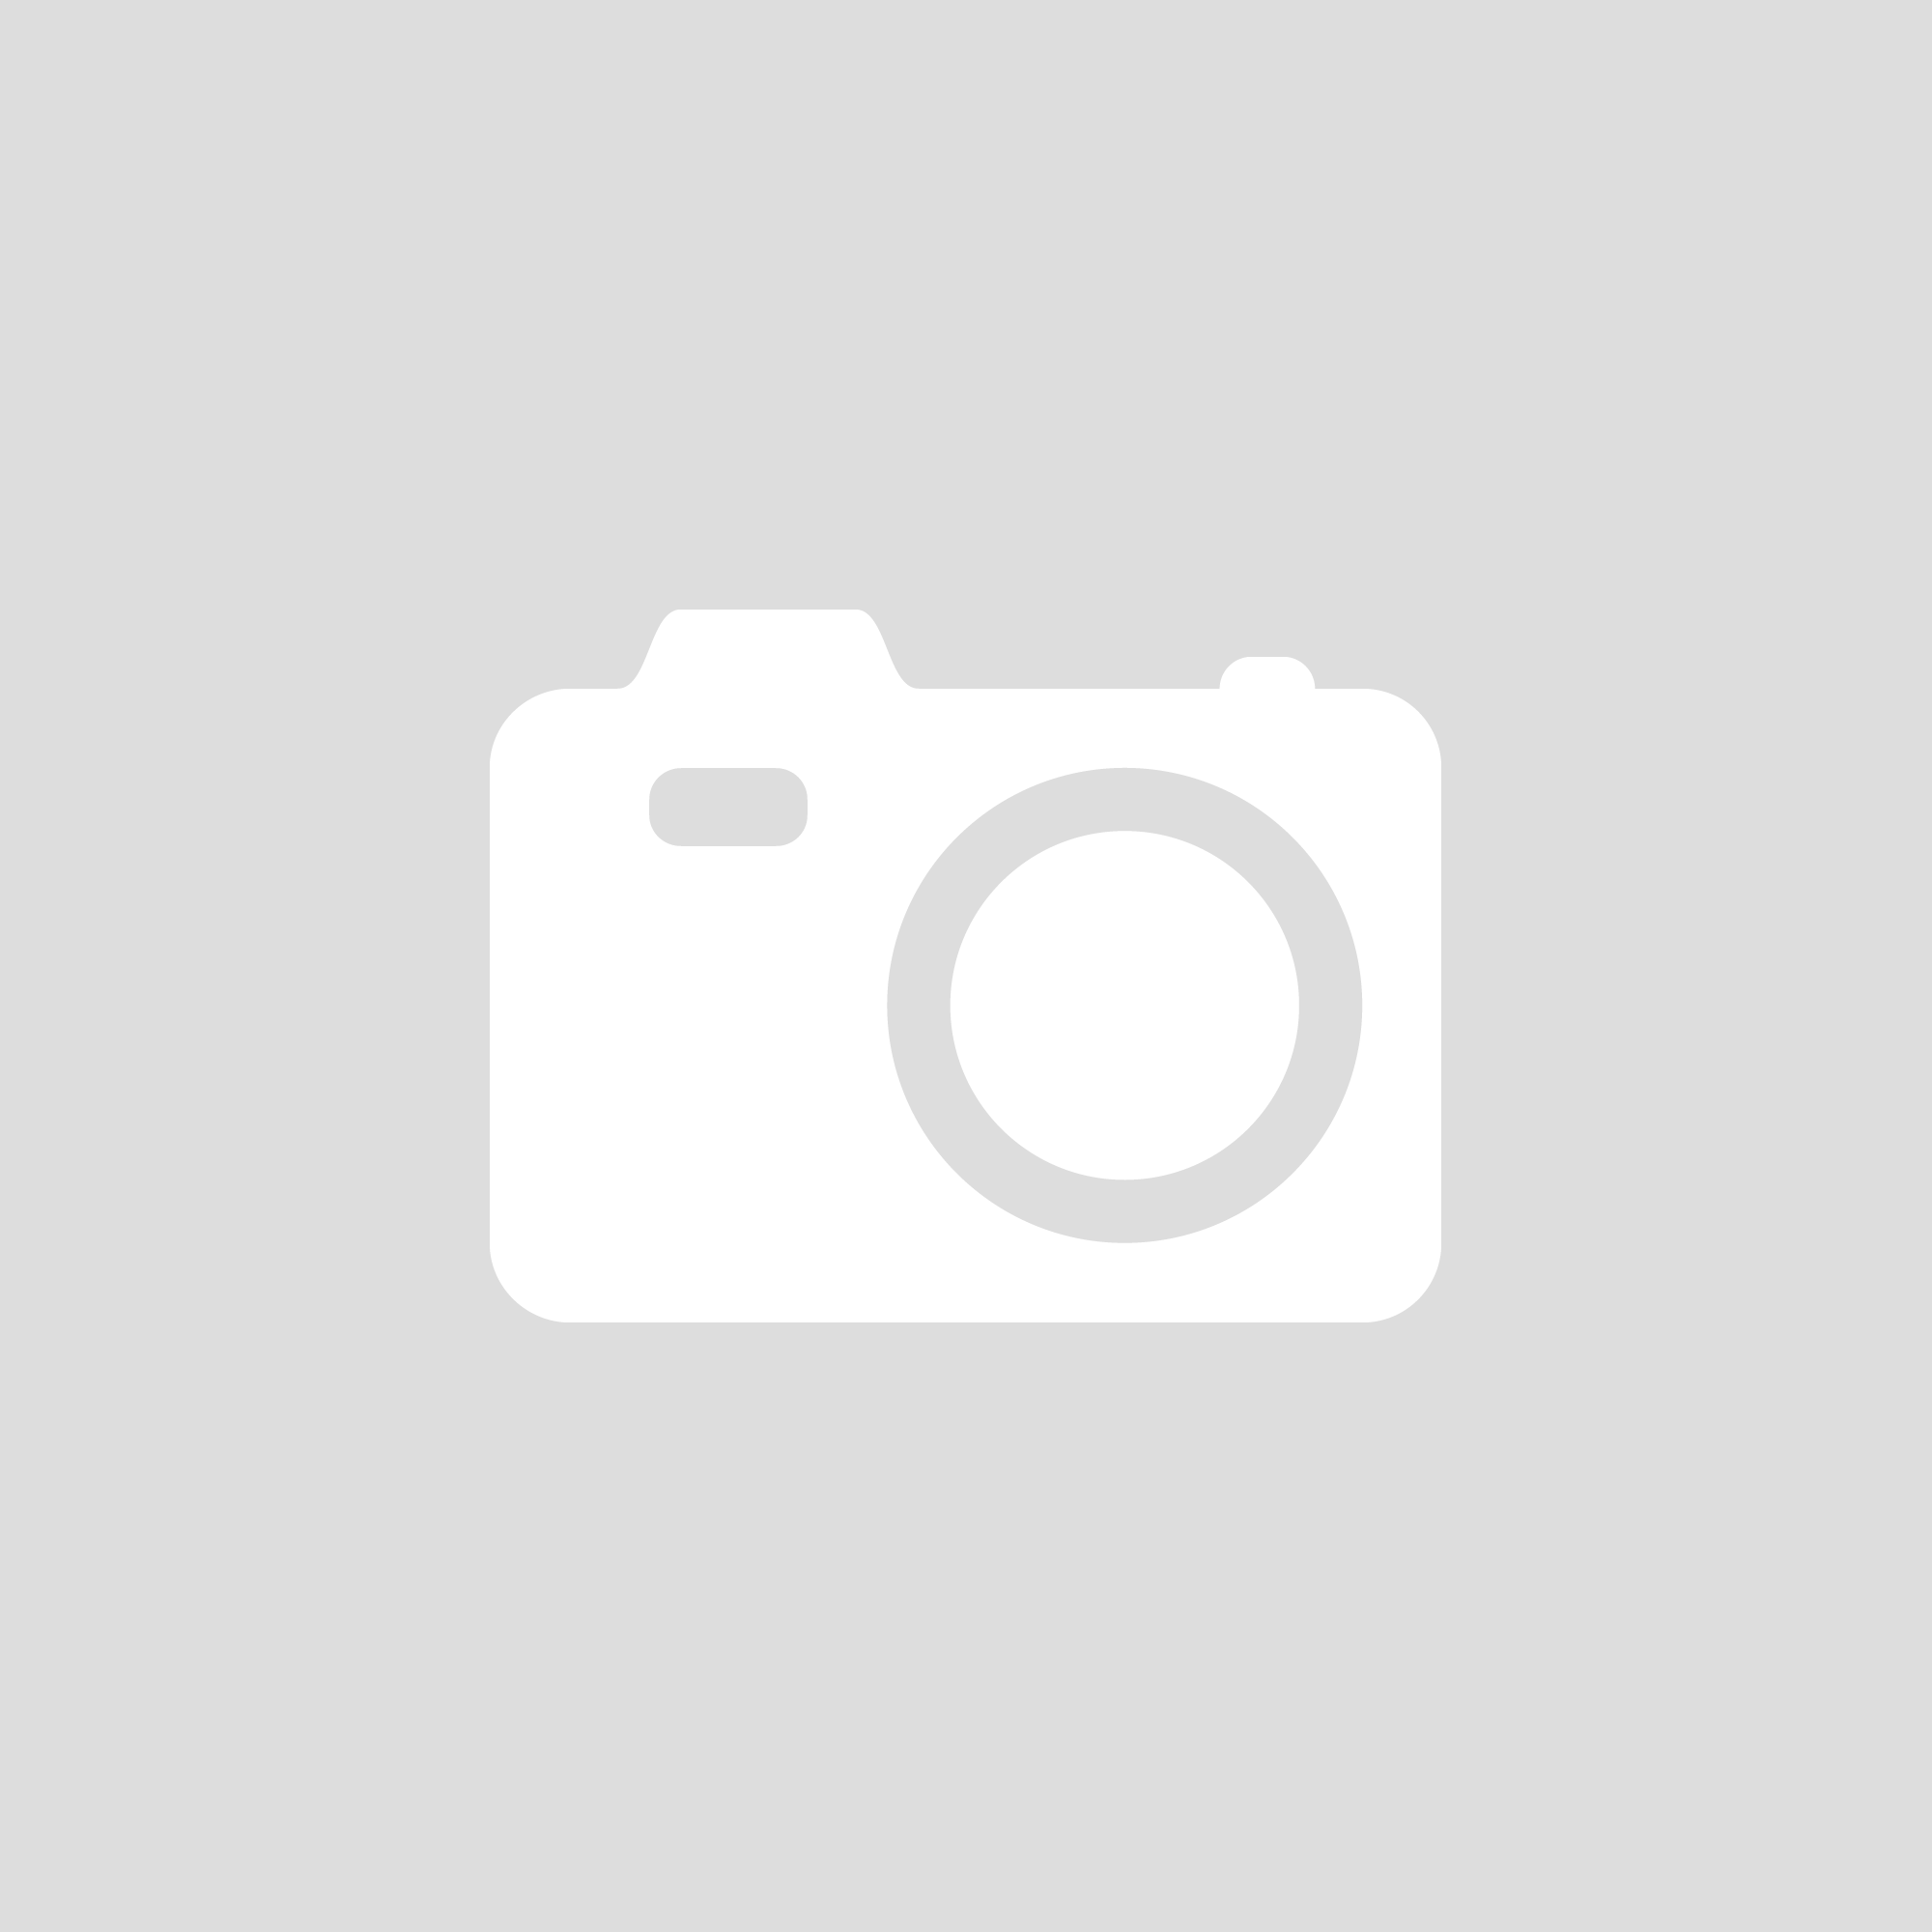 Summer of Love 'En Pointe' Figurine Lavender / Champagne by CIMC